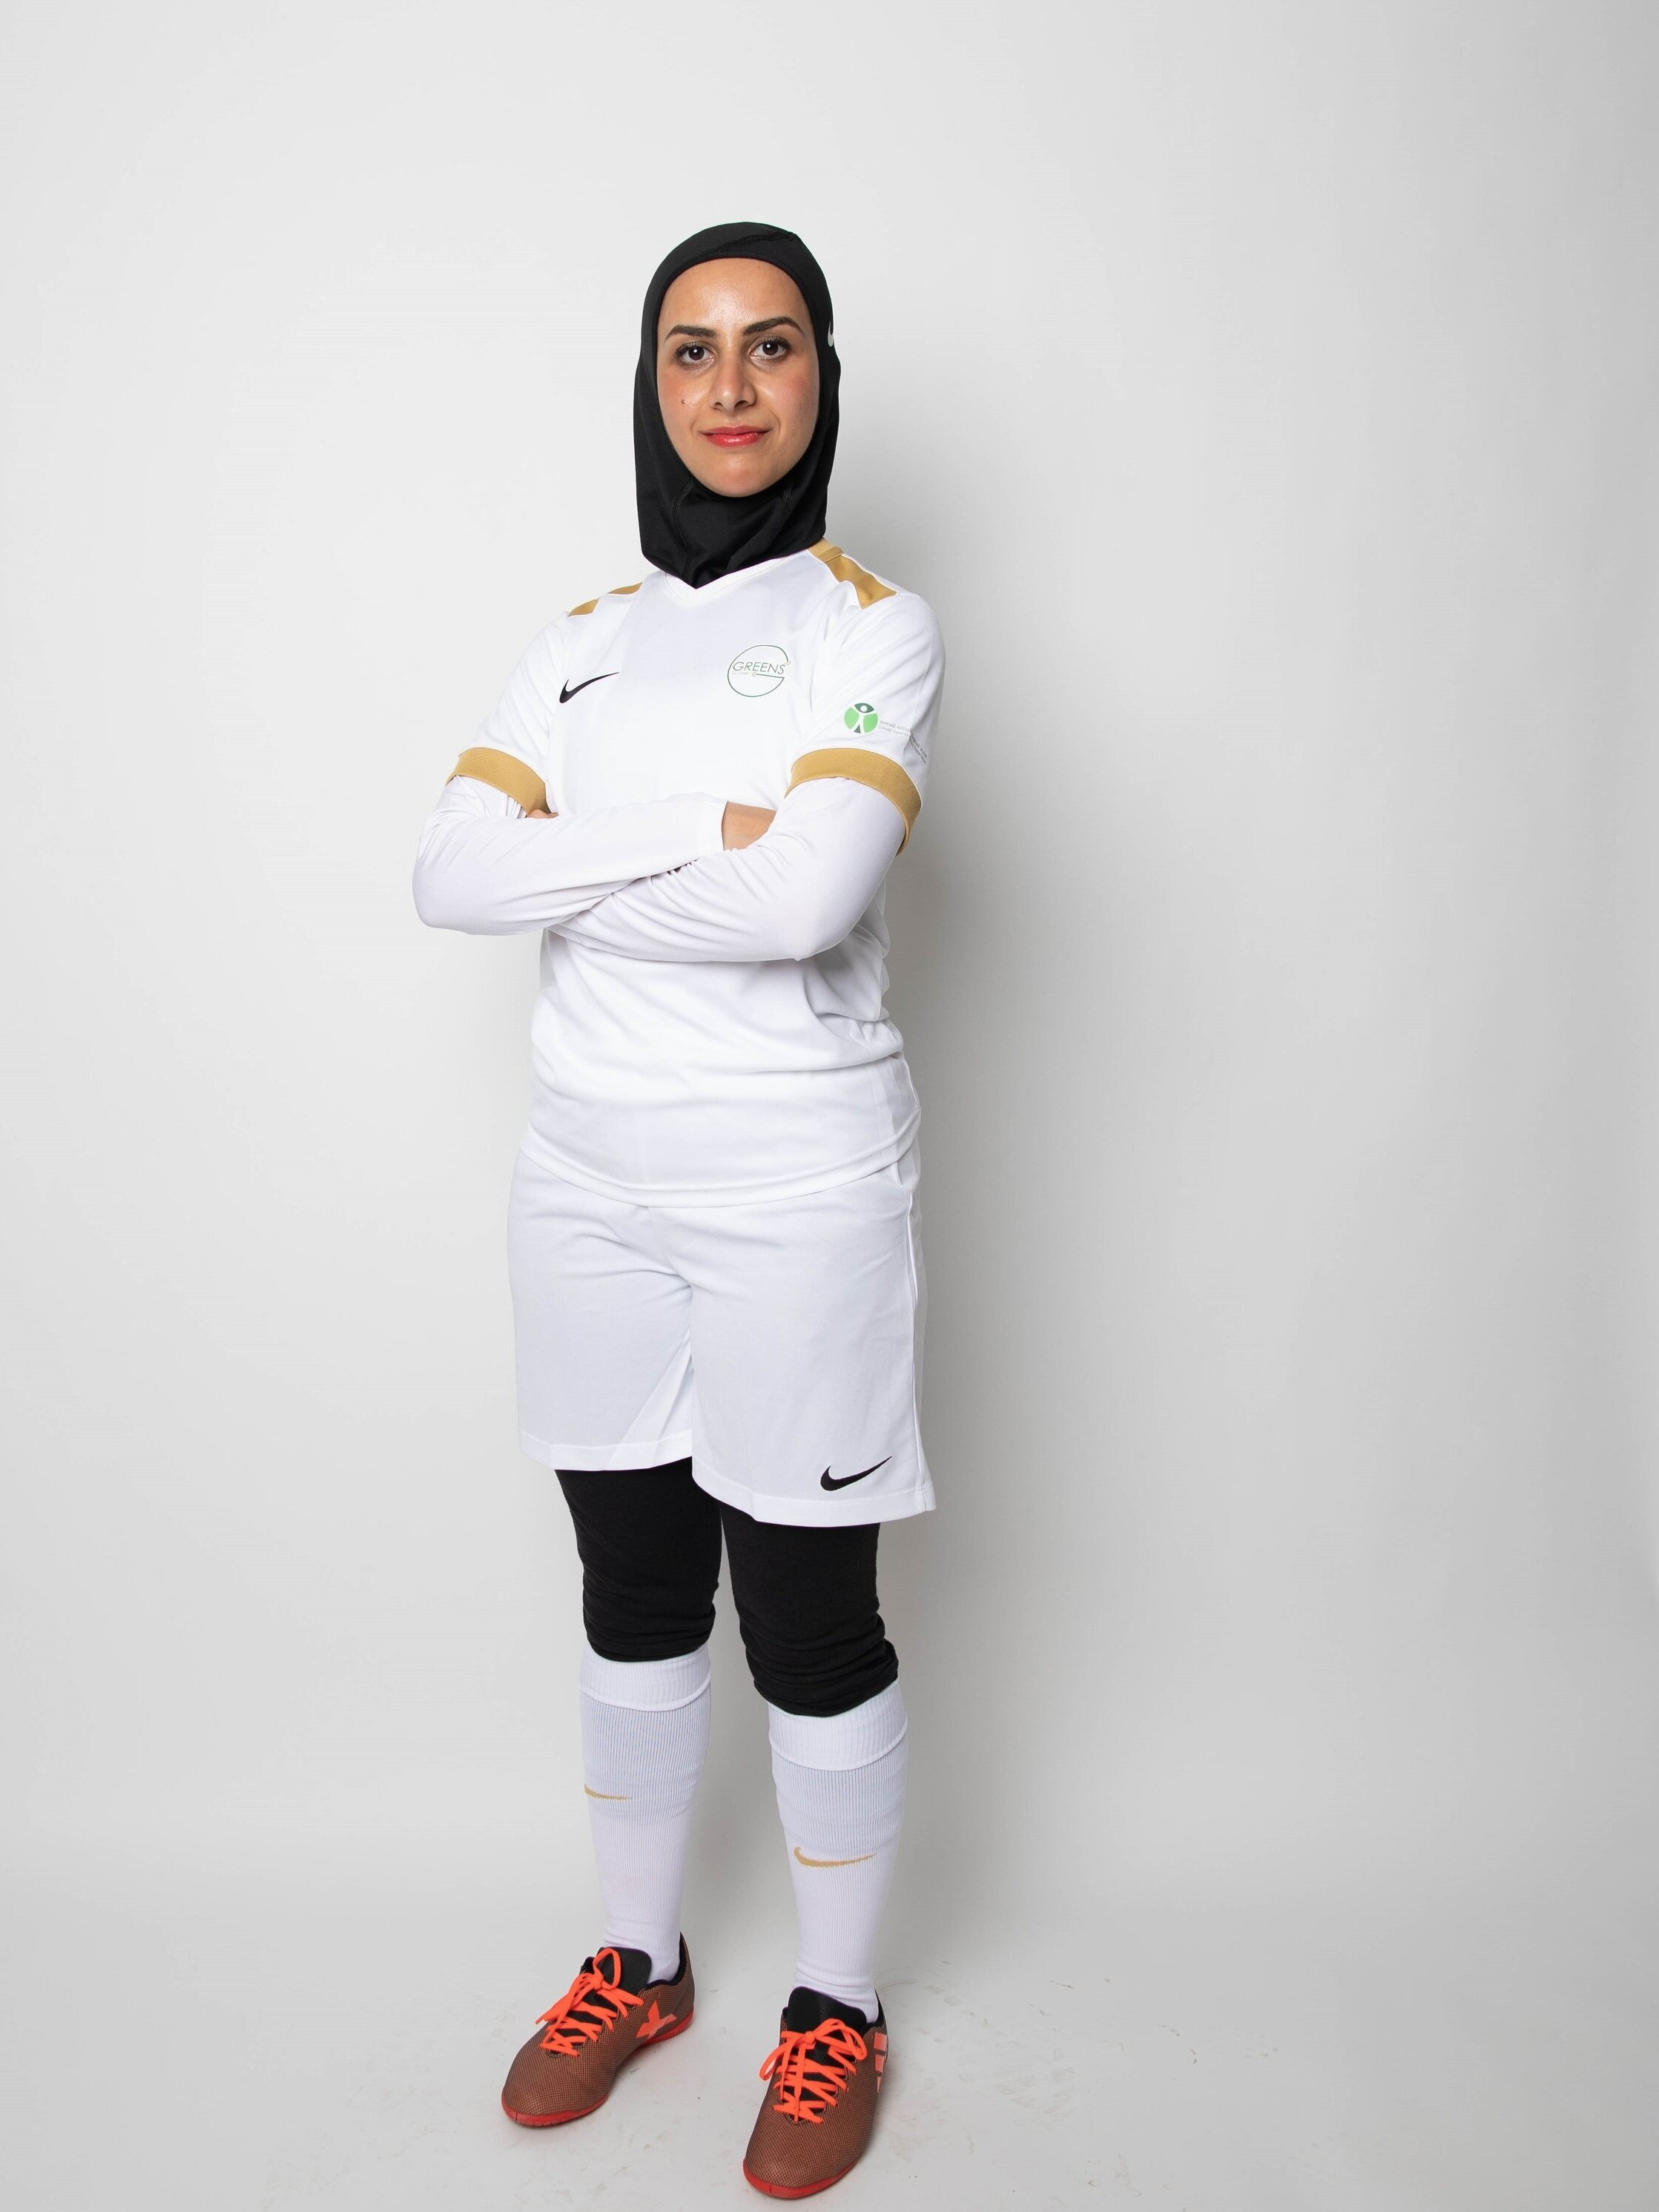 GGWCup NYC finals 2019 Team Greens Mayadah Alhashem.jpg